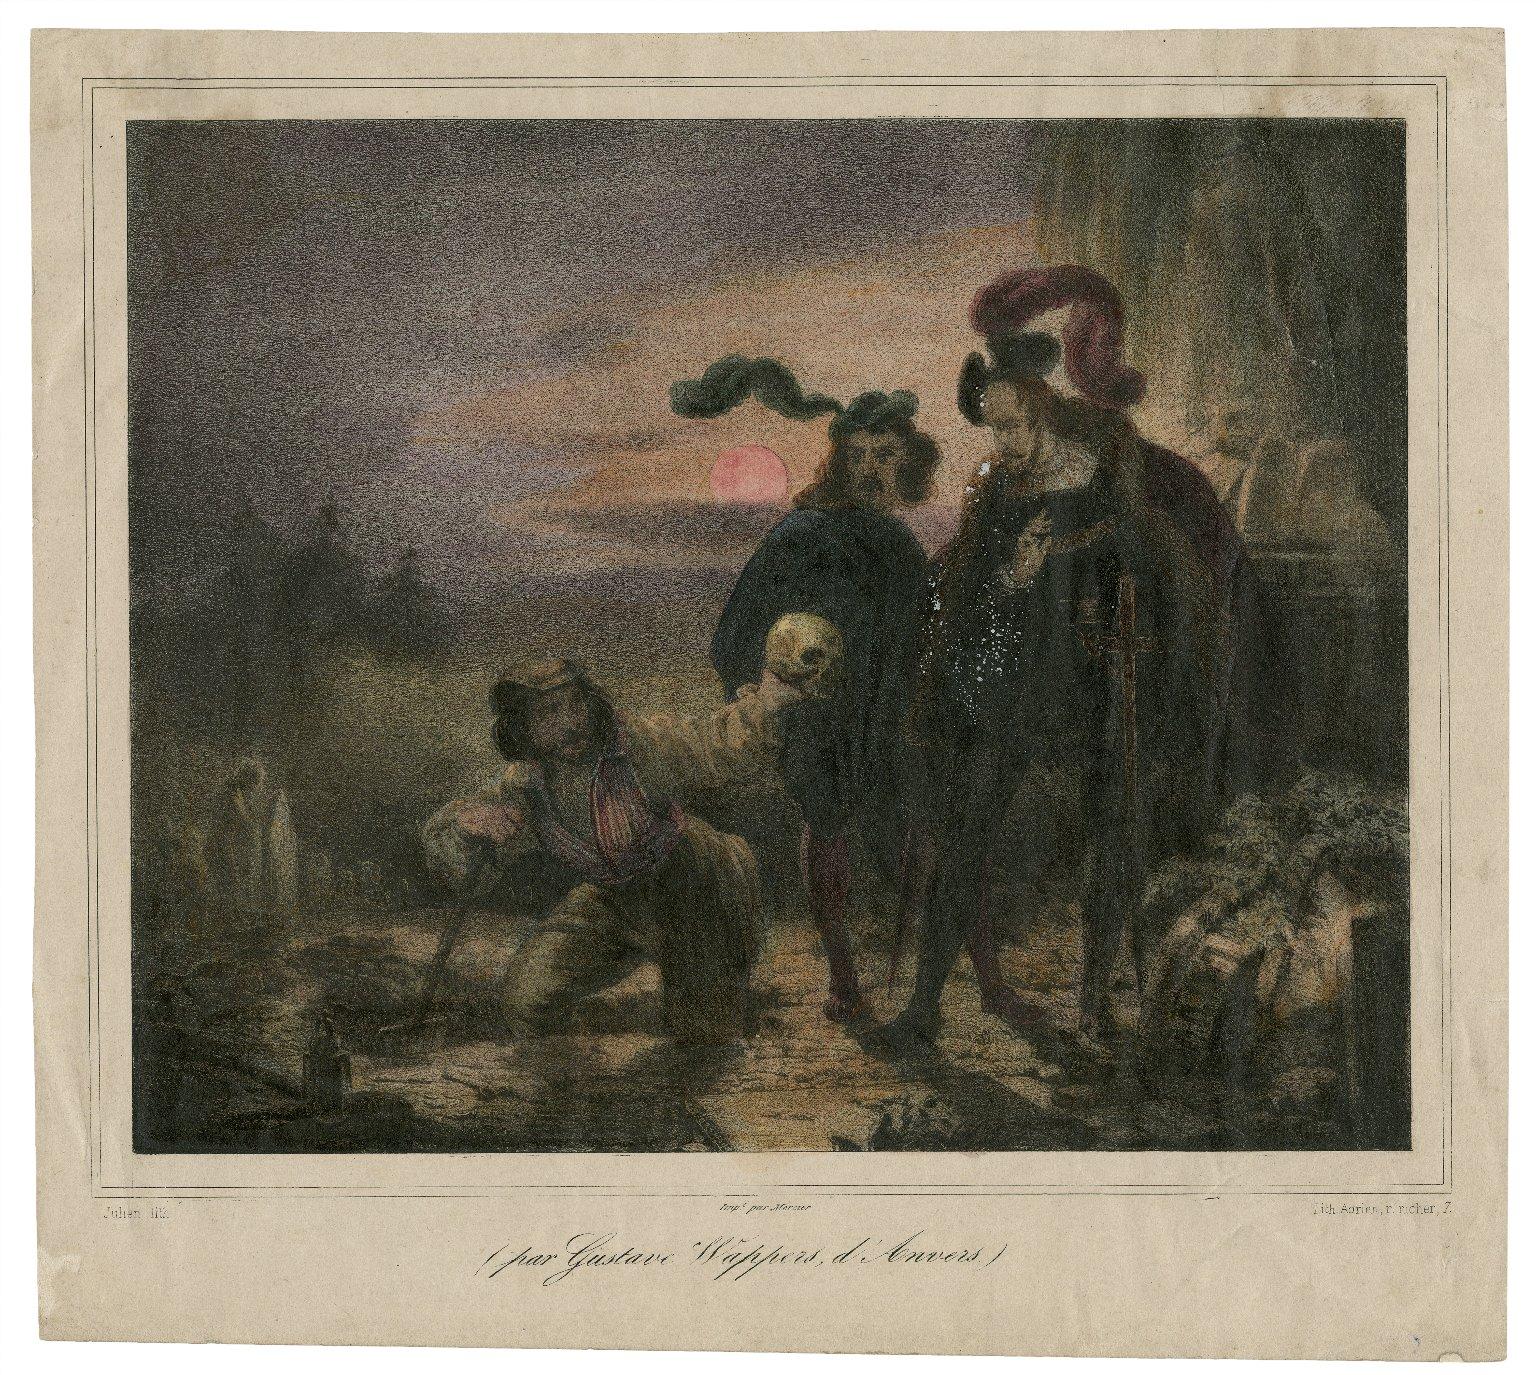 [Hamlet, act V, scene 1] [graphic] / [par Gustave Wappers, d'Anvers] ; Julien lith.